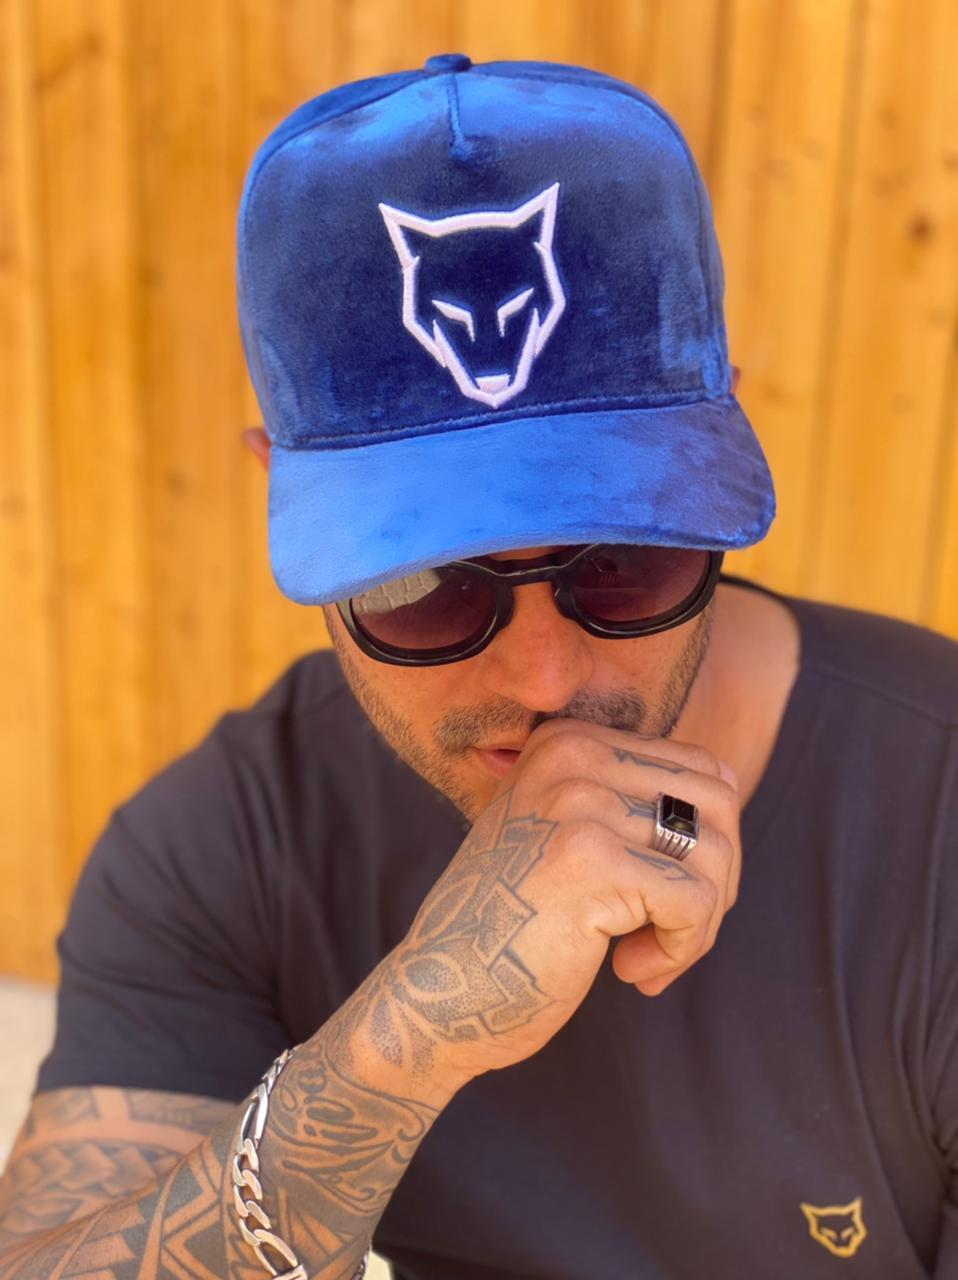 Boné Volk Culture Suede Aba Curva Azul  - Harpia Moda - Moda Masculina & Acessórios